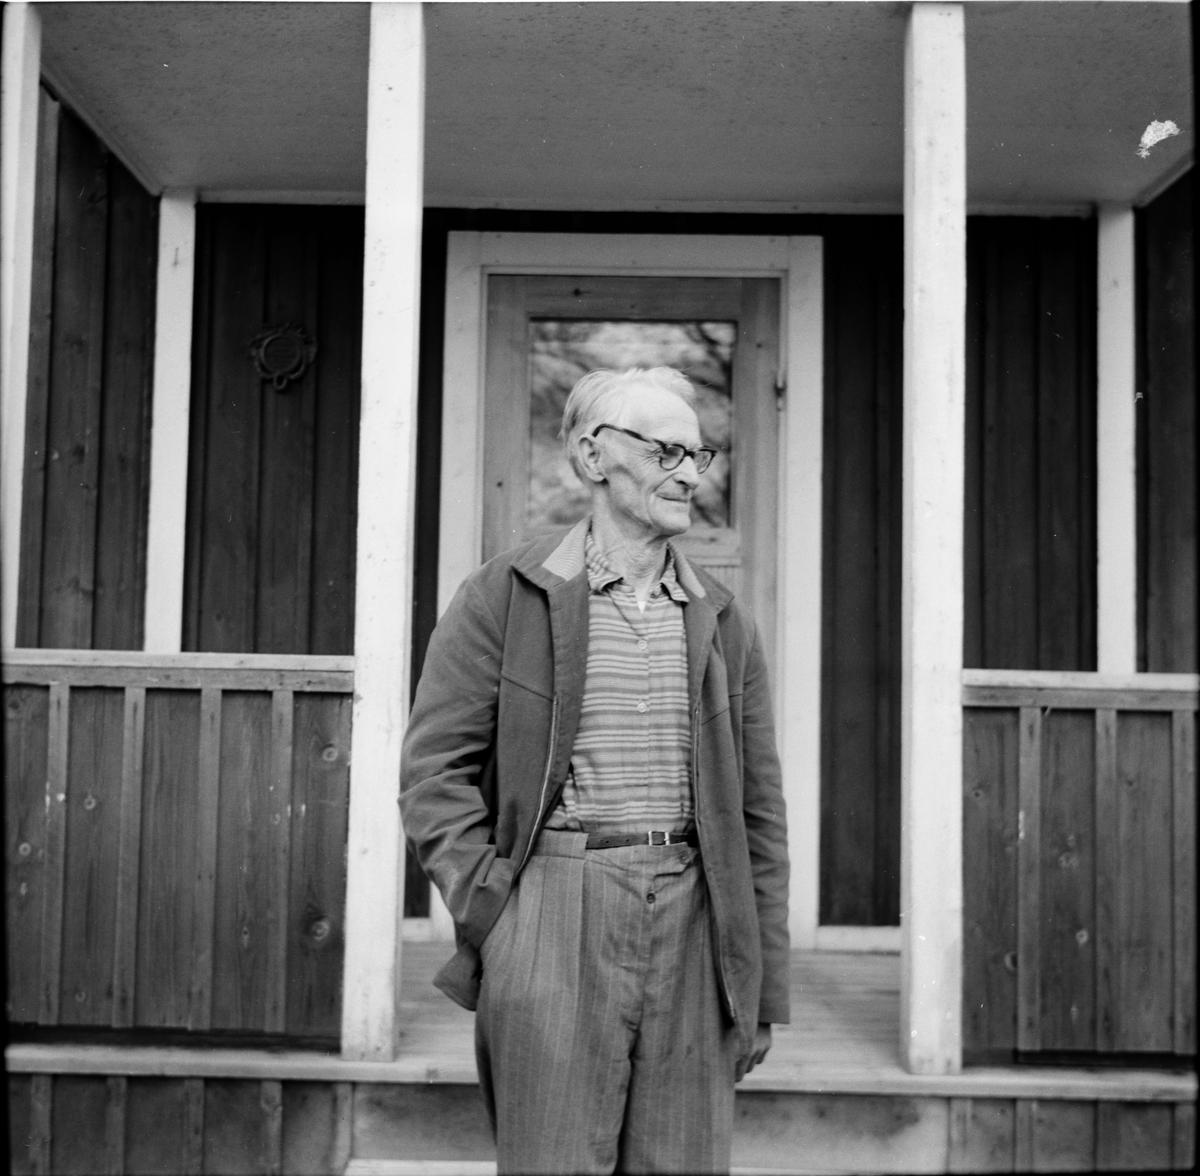 Rickebo. Gösens Gös-Johan Persson vid Nilsens i Gällsjön. 22/5-1966